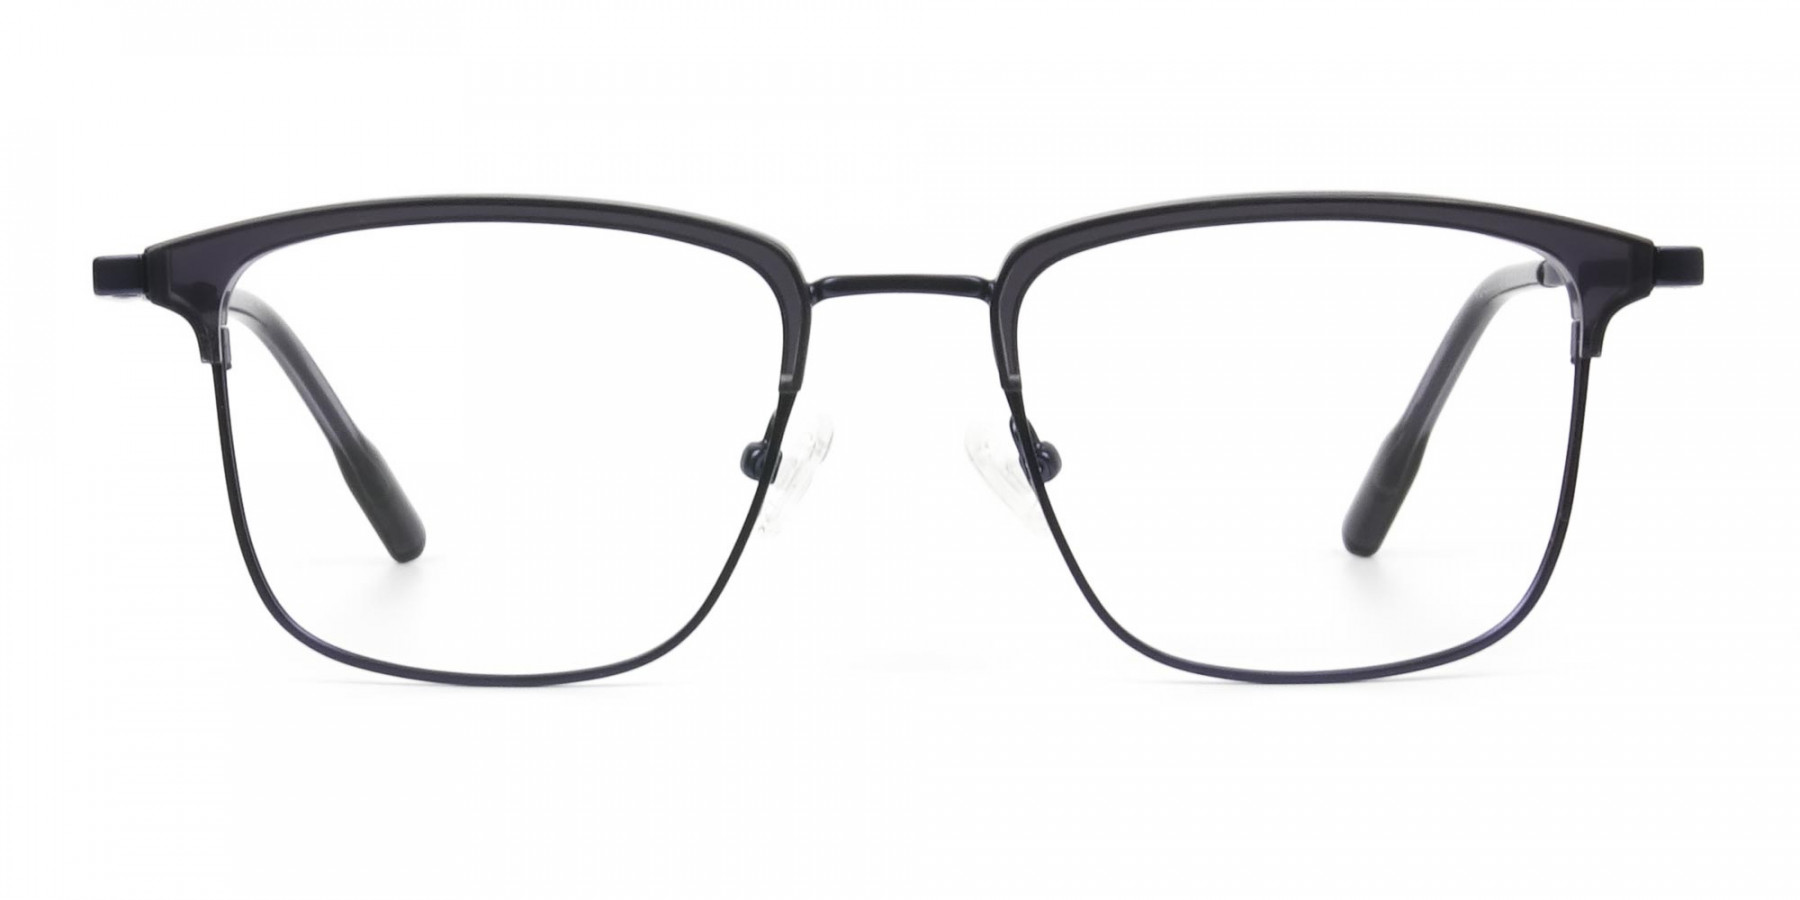 Navy Blue & Matt Black Glasses in Metal Browline & Square  - 1